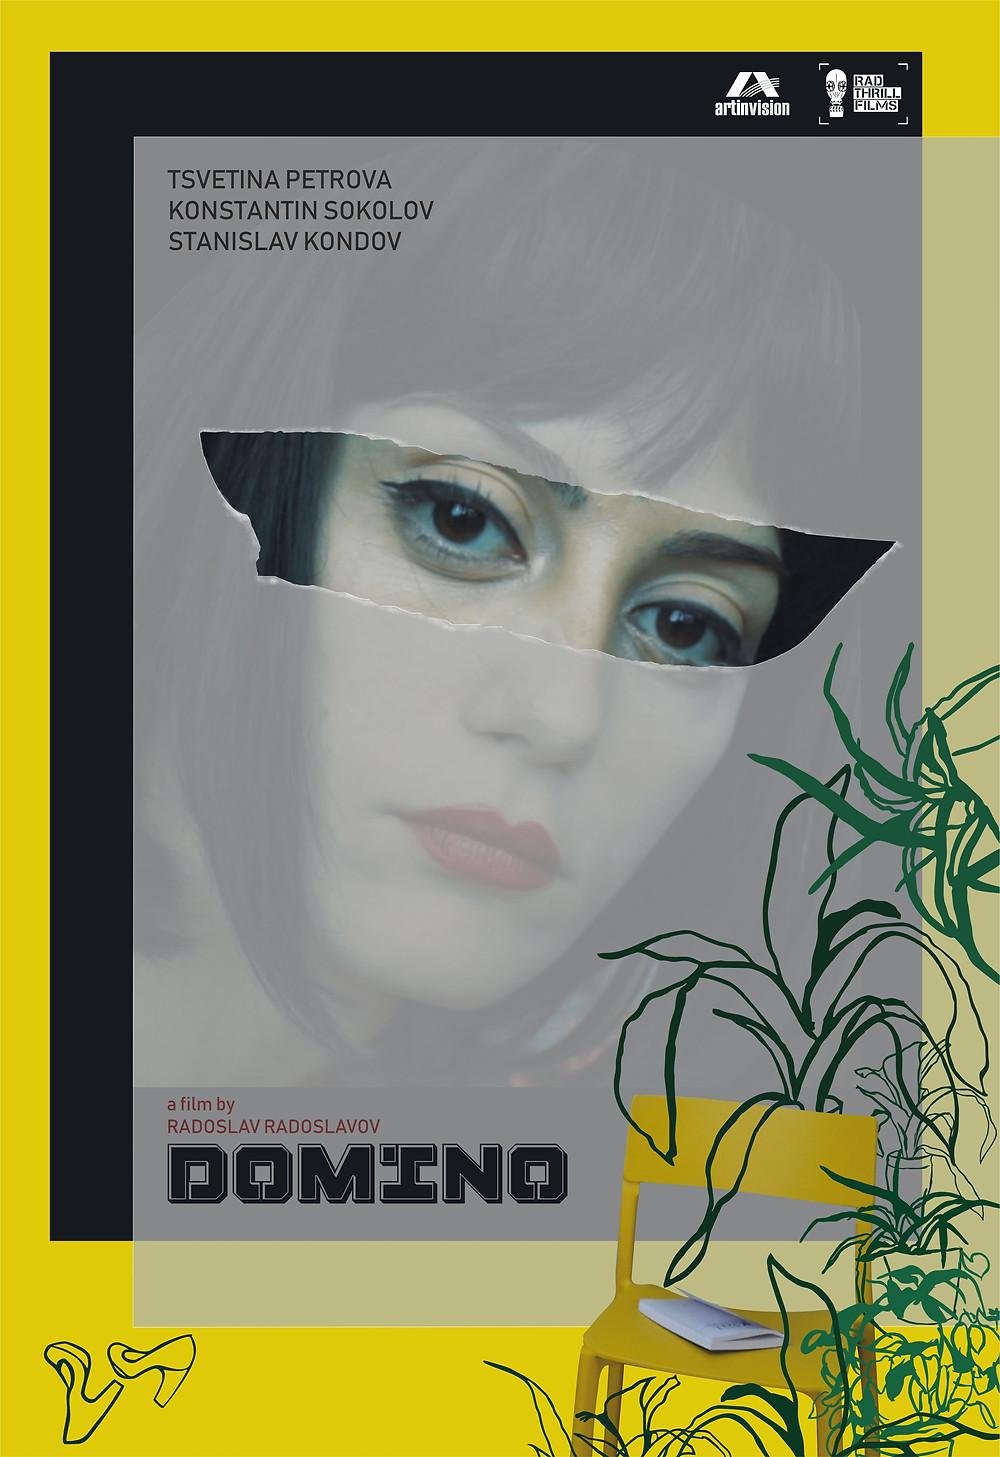 Domino short film poster